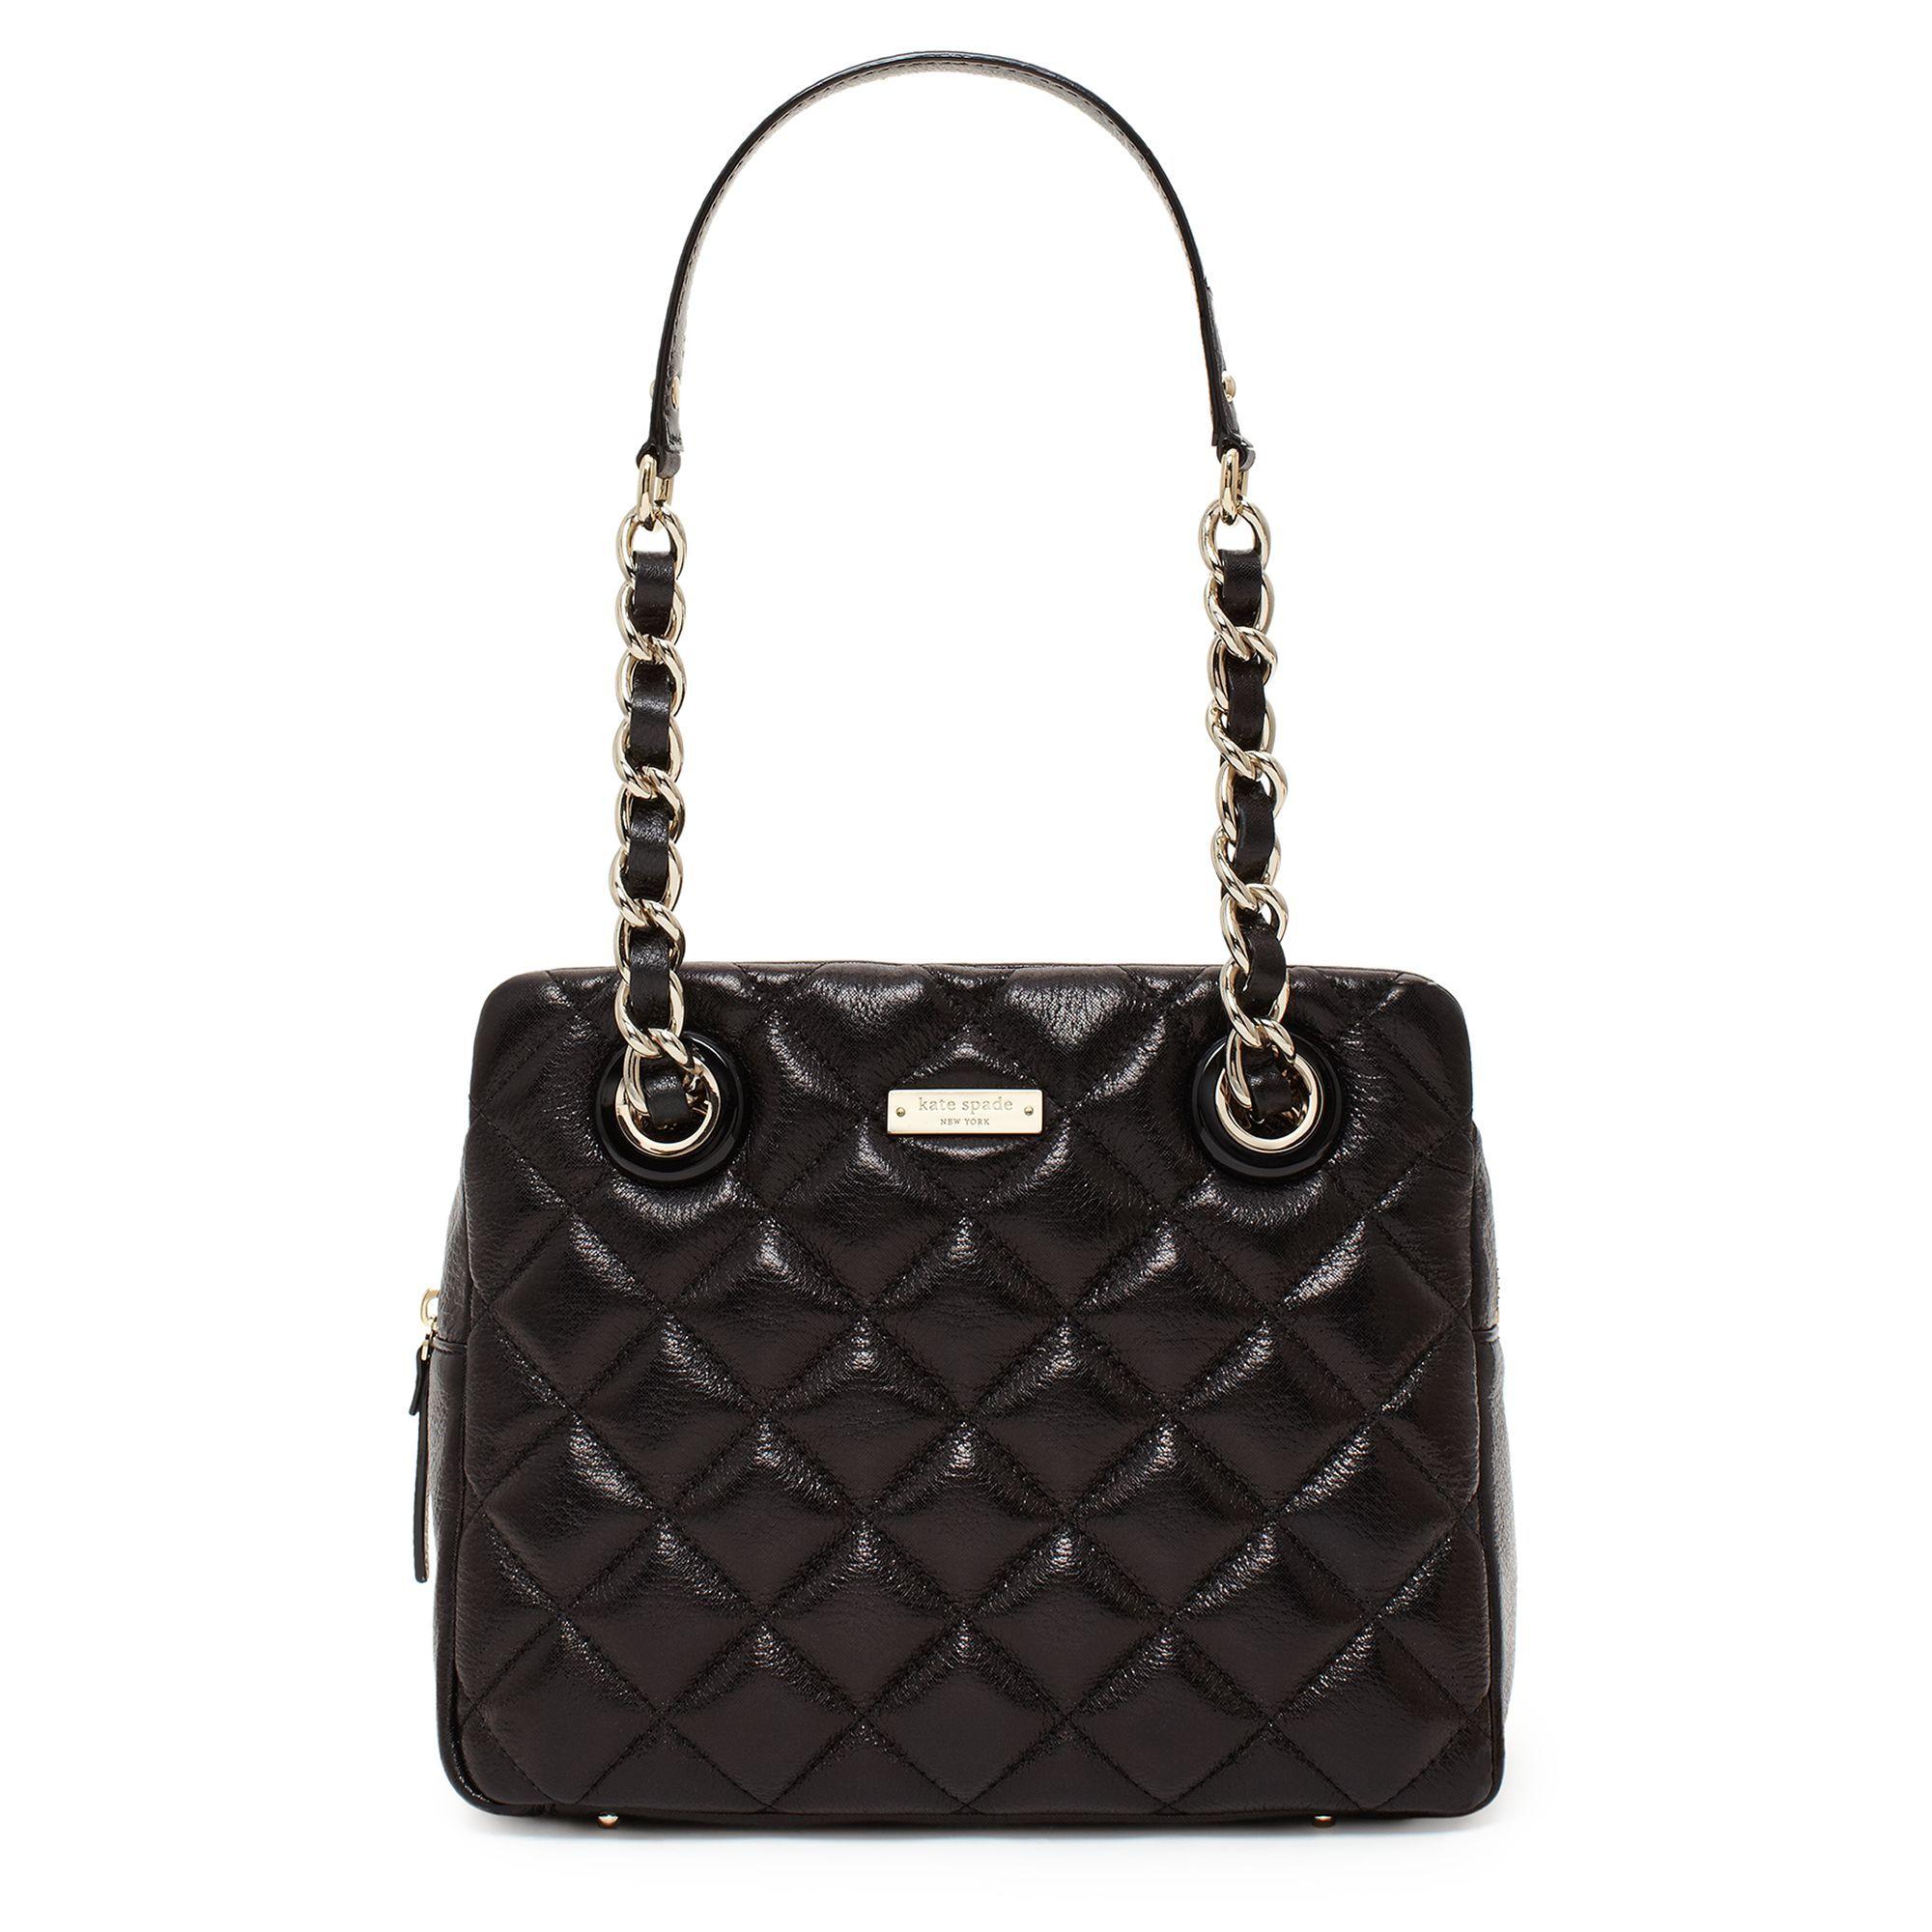 kate spade elizabeth | Kate spade leather handbags ...